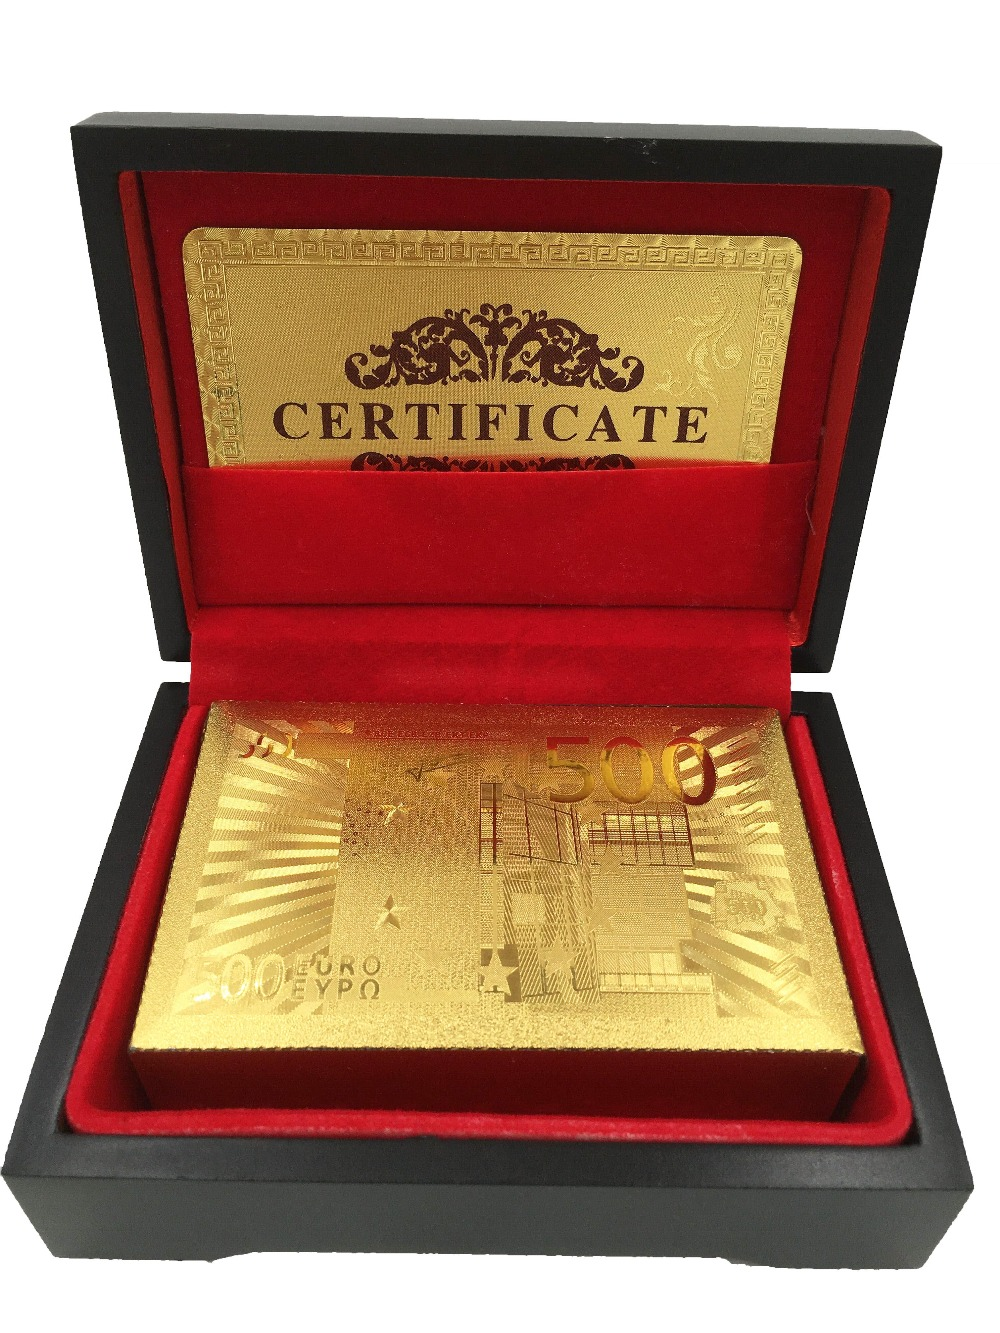 Euro 500 24K Carat Gold Foil Plated Poker Card Game